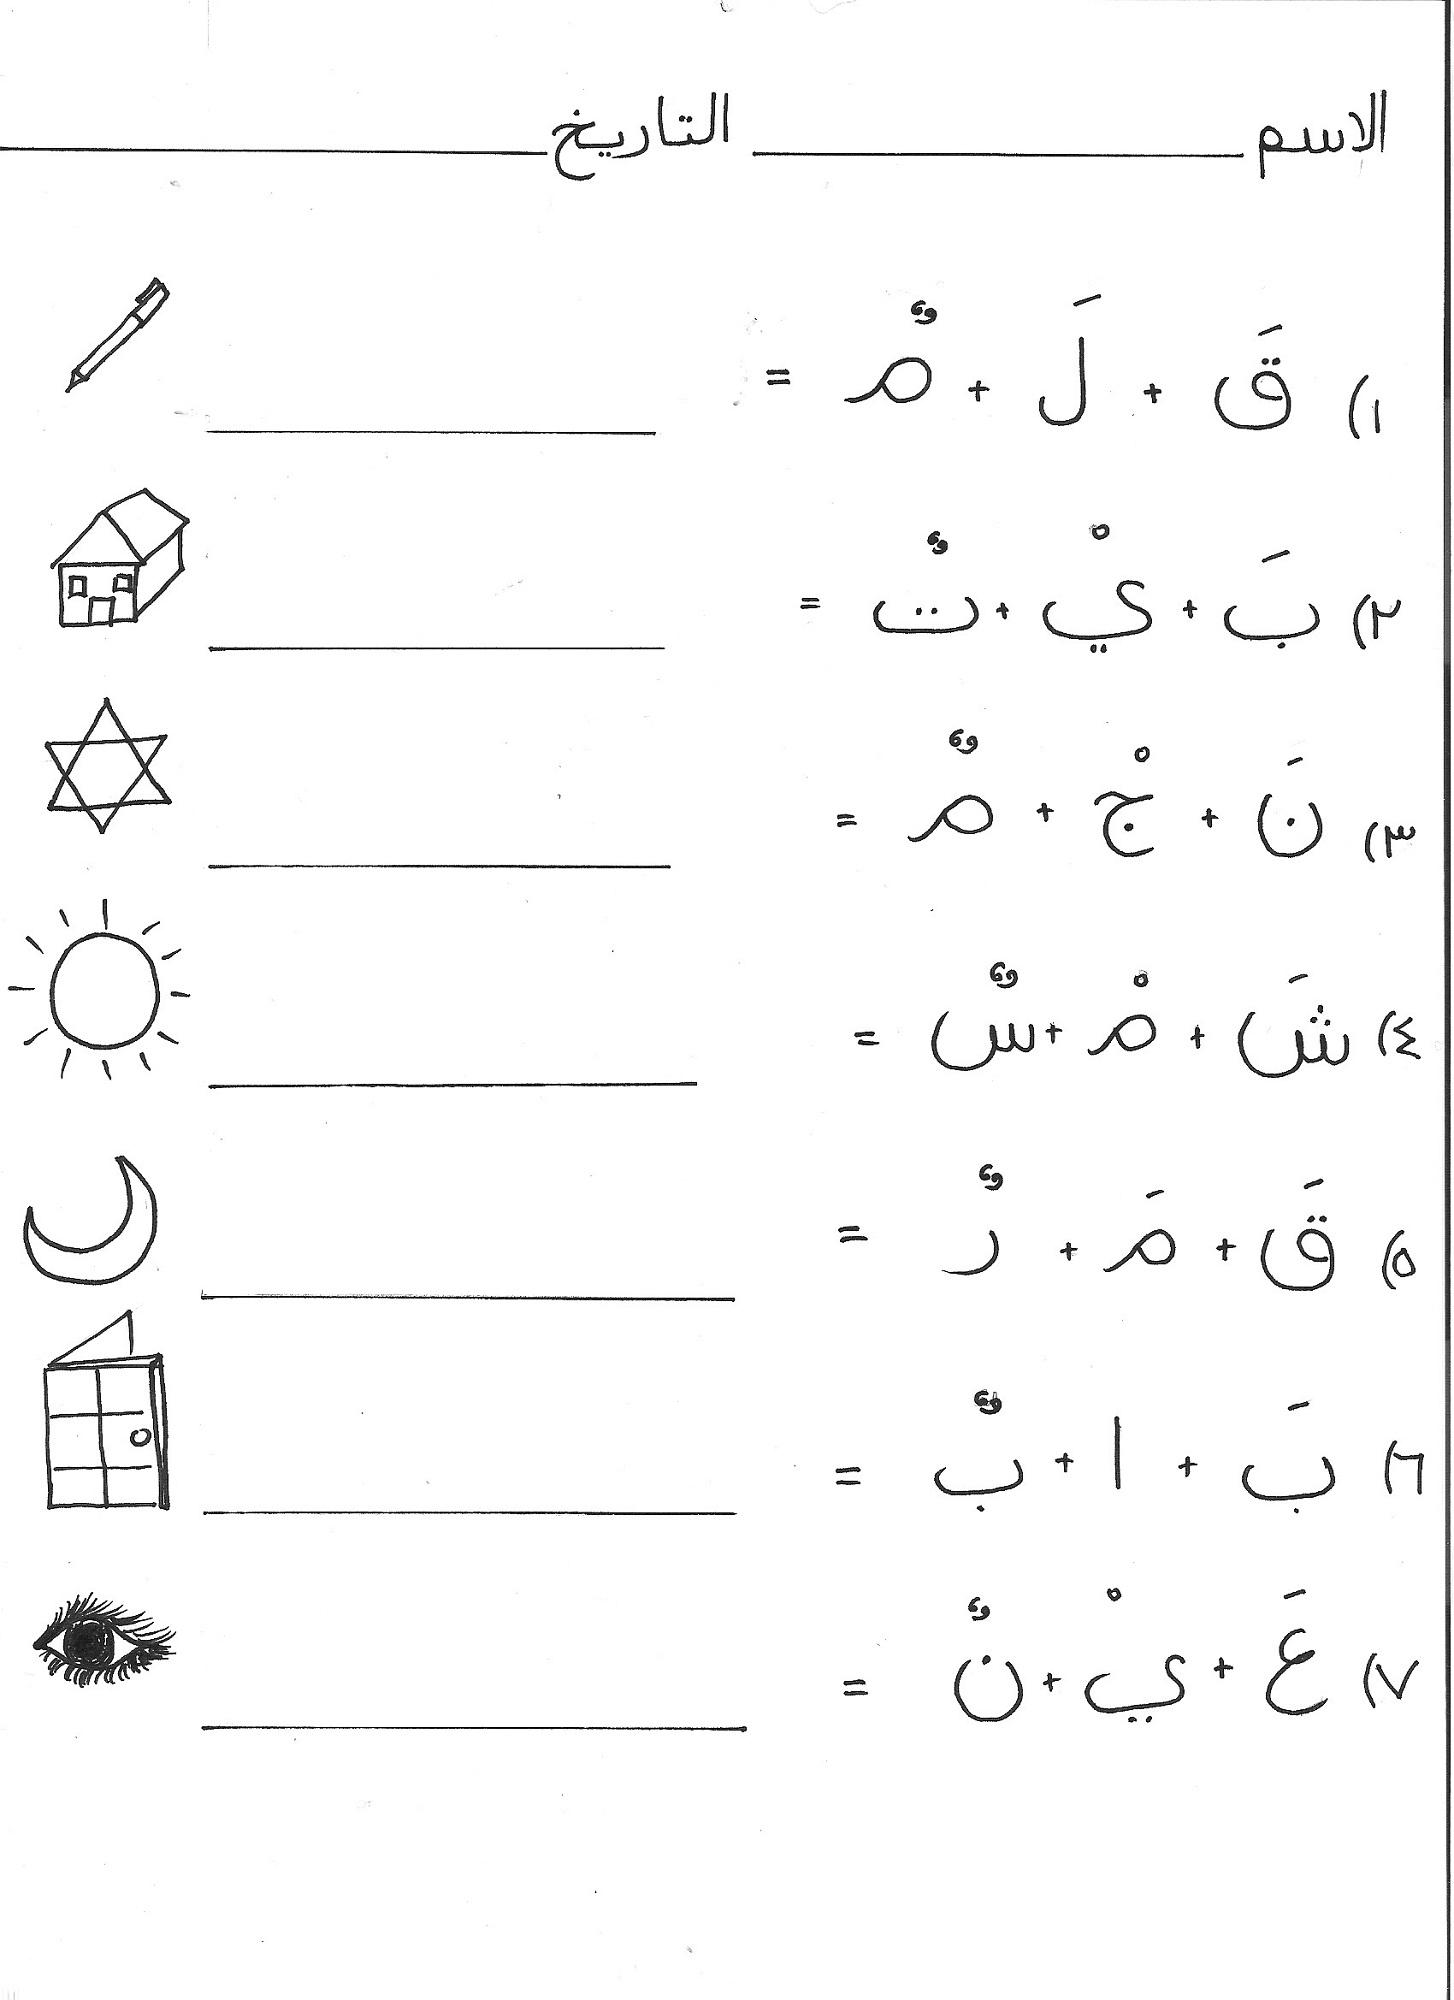 graphic regarding Arabic Alphabet Worksheets Printable identify Arabic Alphabet Worksheets Game Shelter